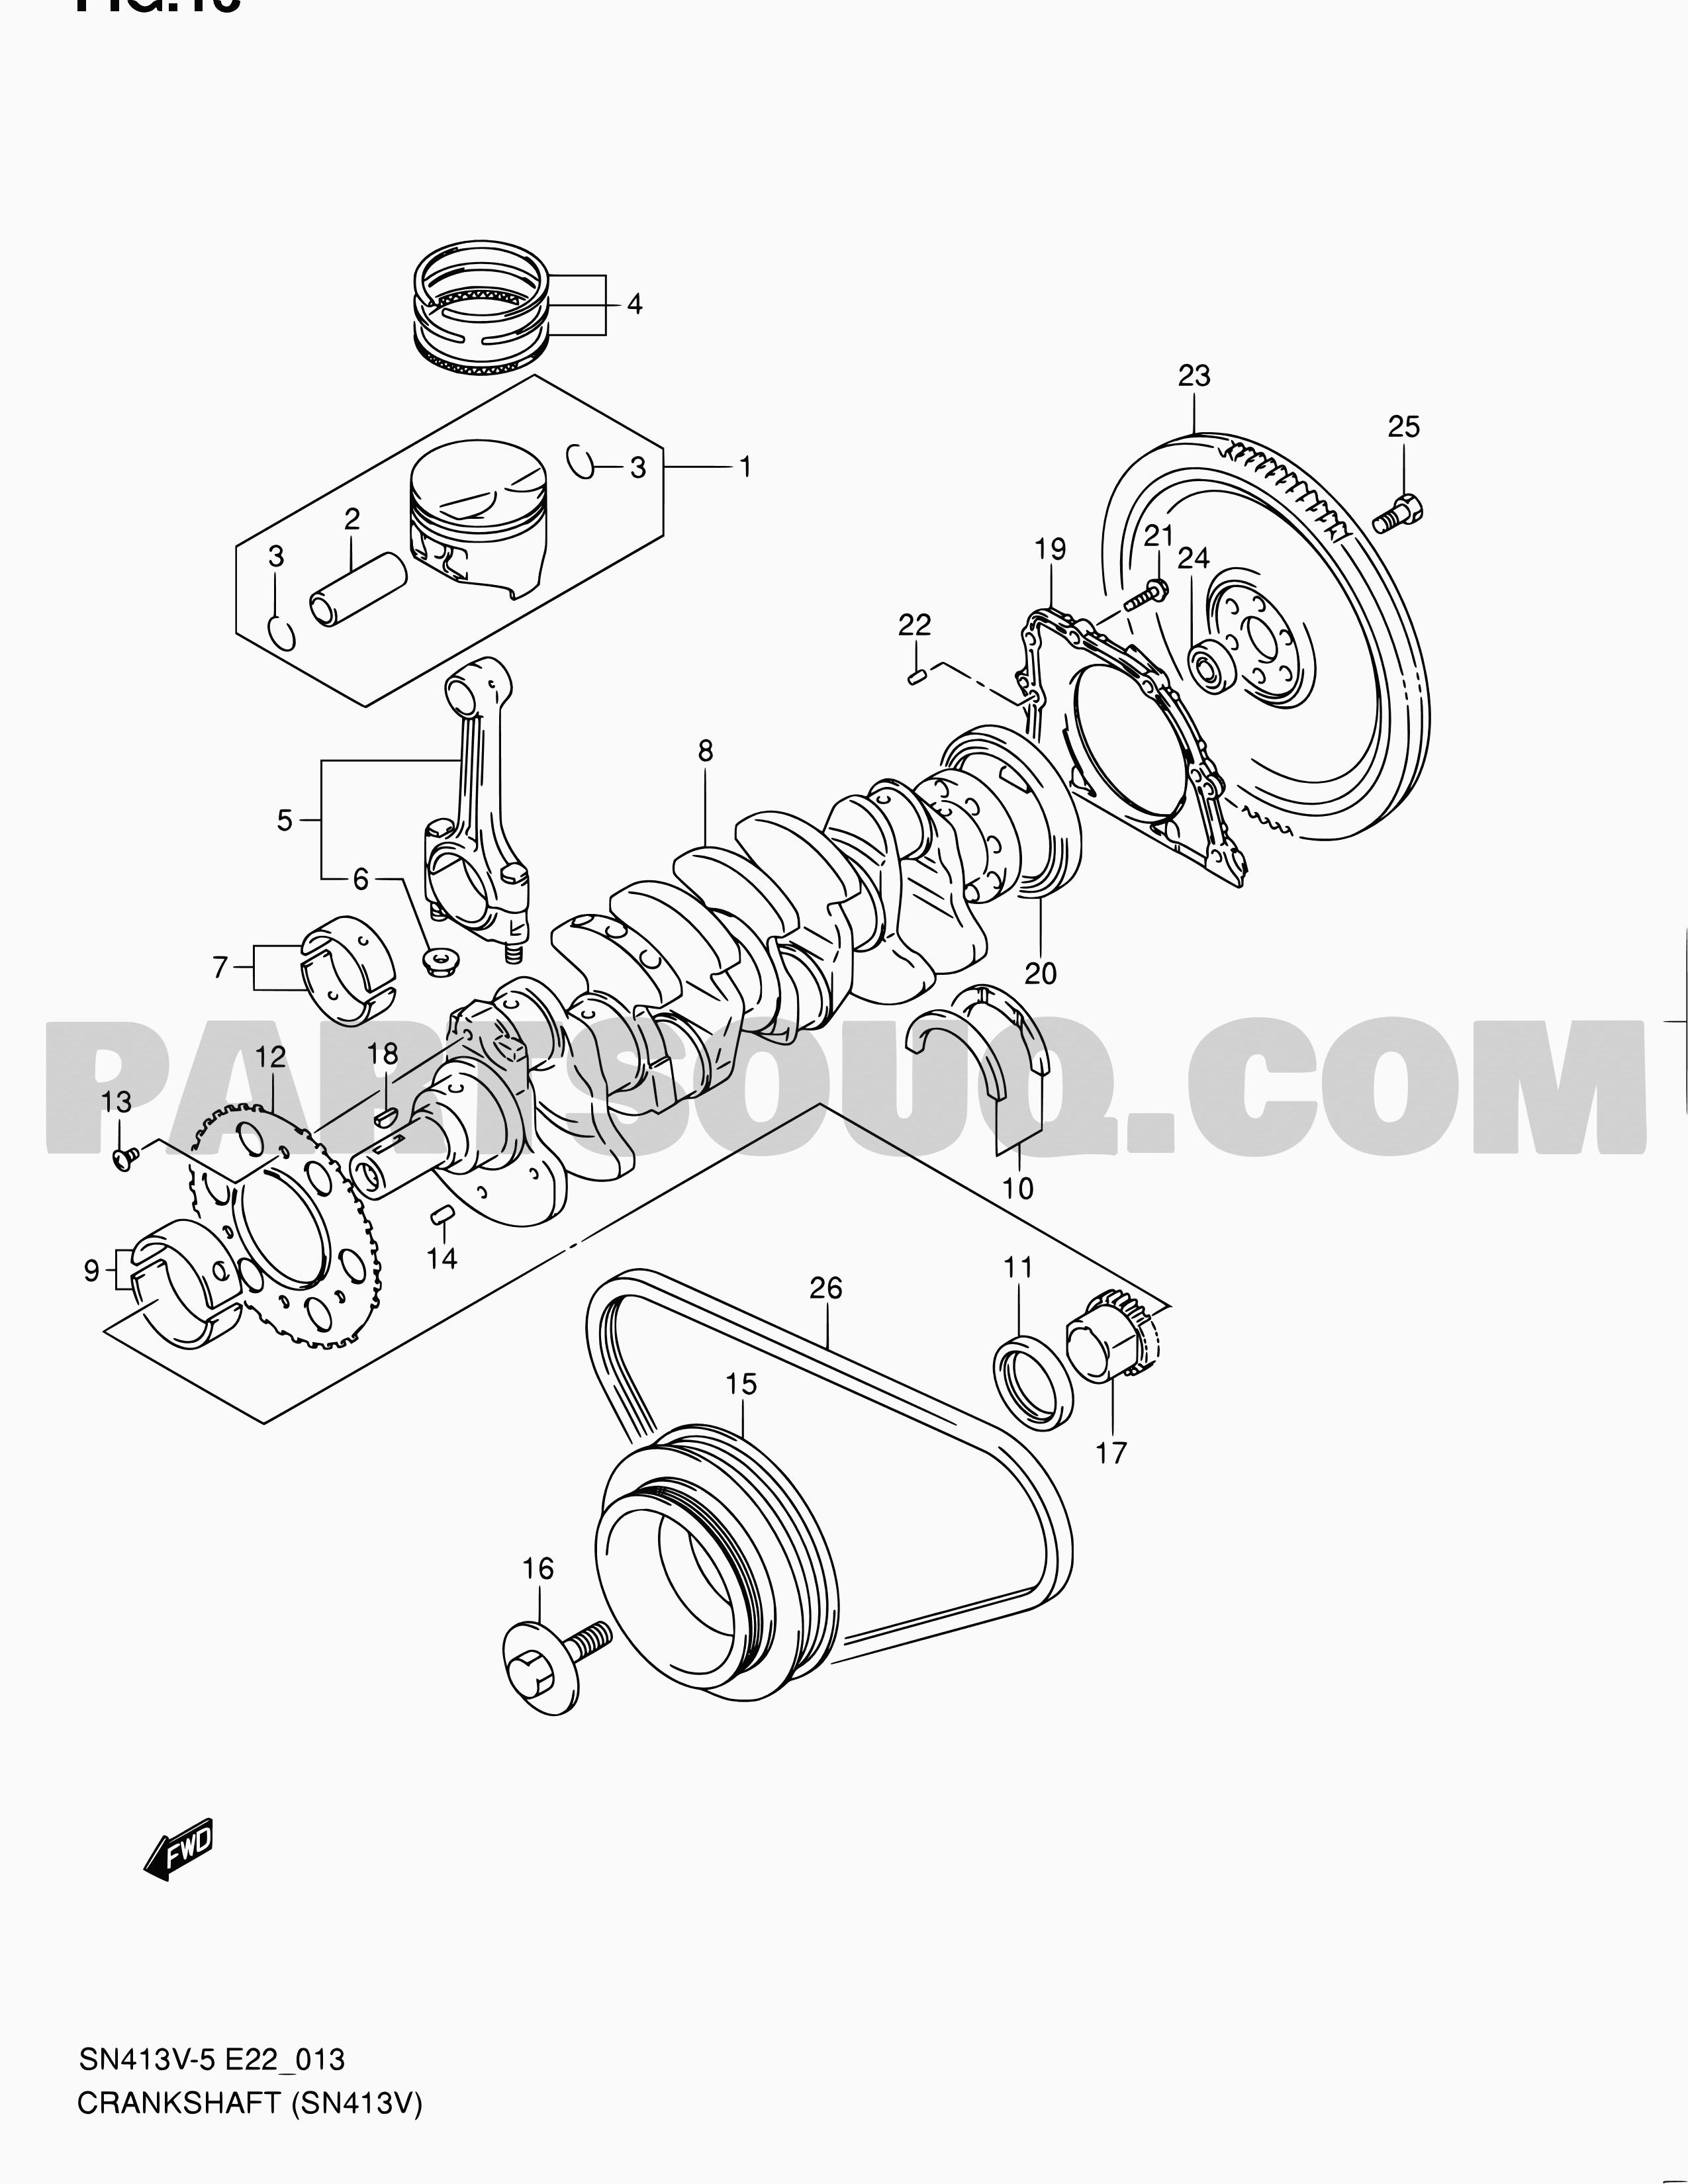 Suzuki jimny m13a wiring diagram images gallery